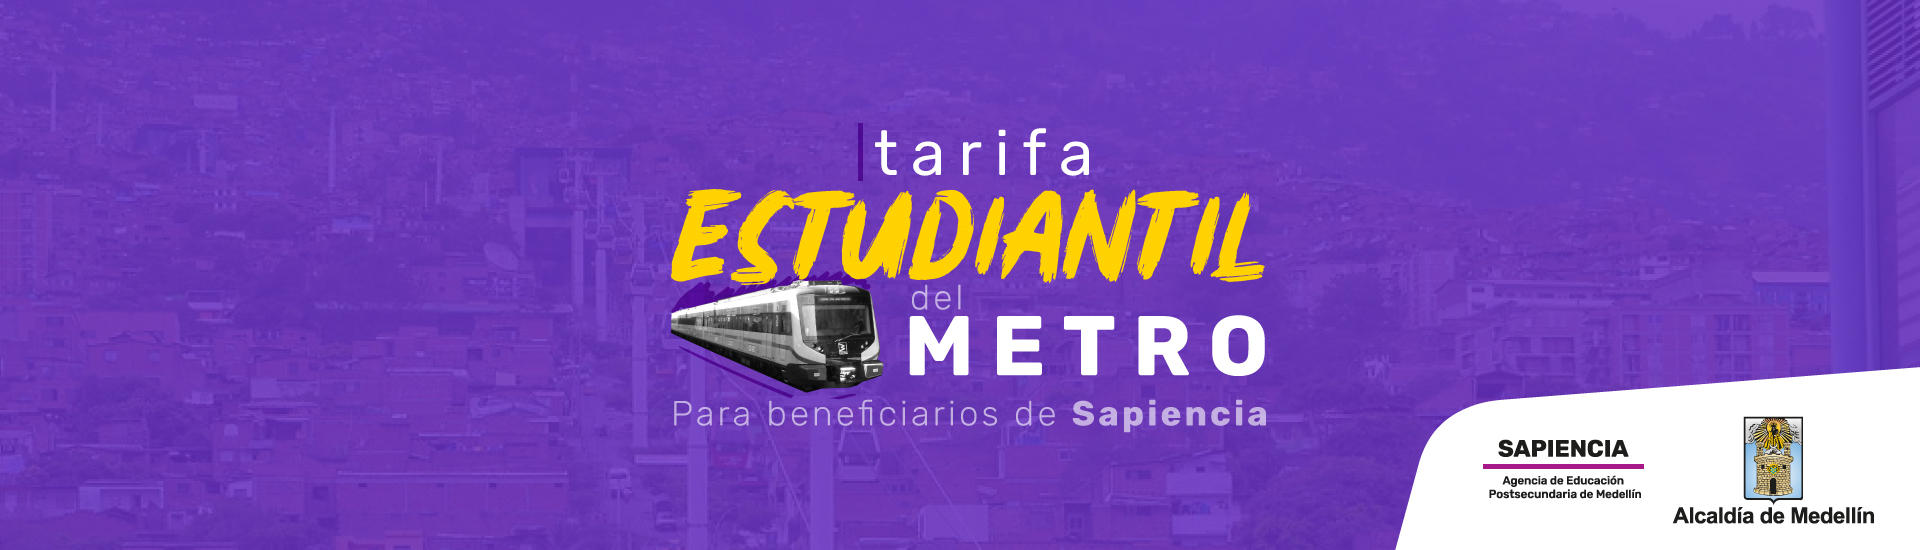 banner_1920x550-metro-tarifa